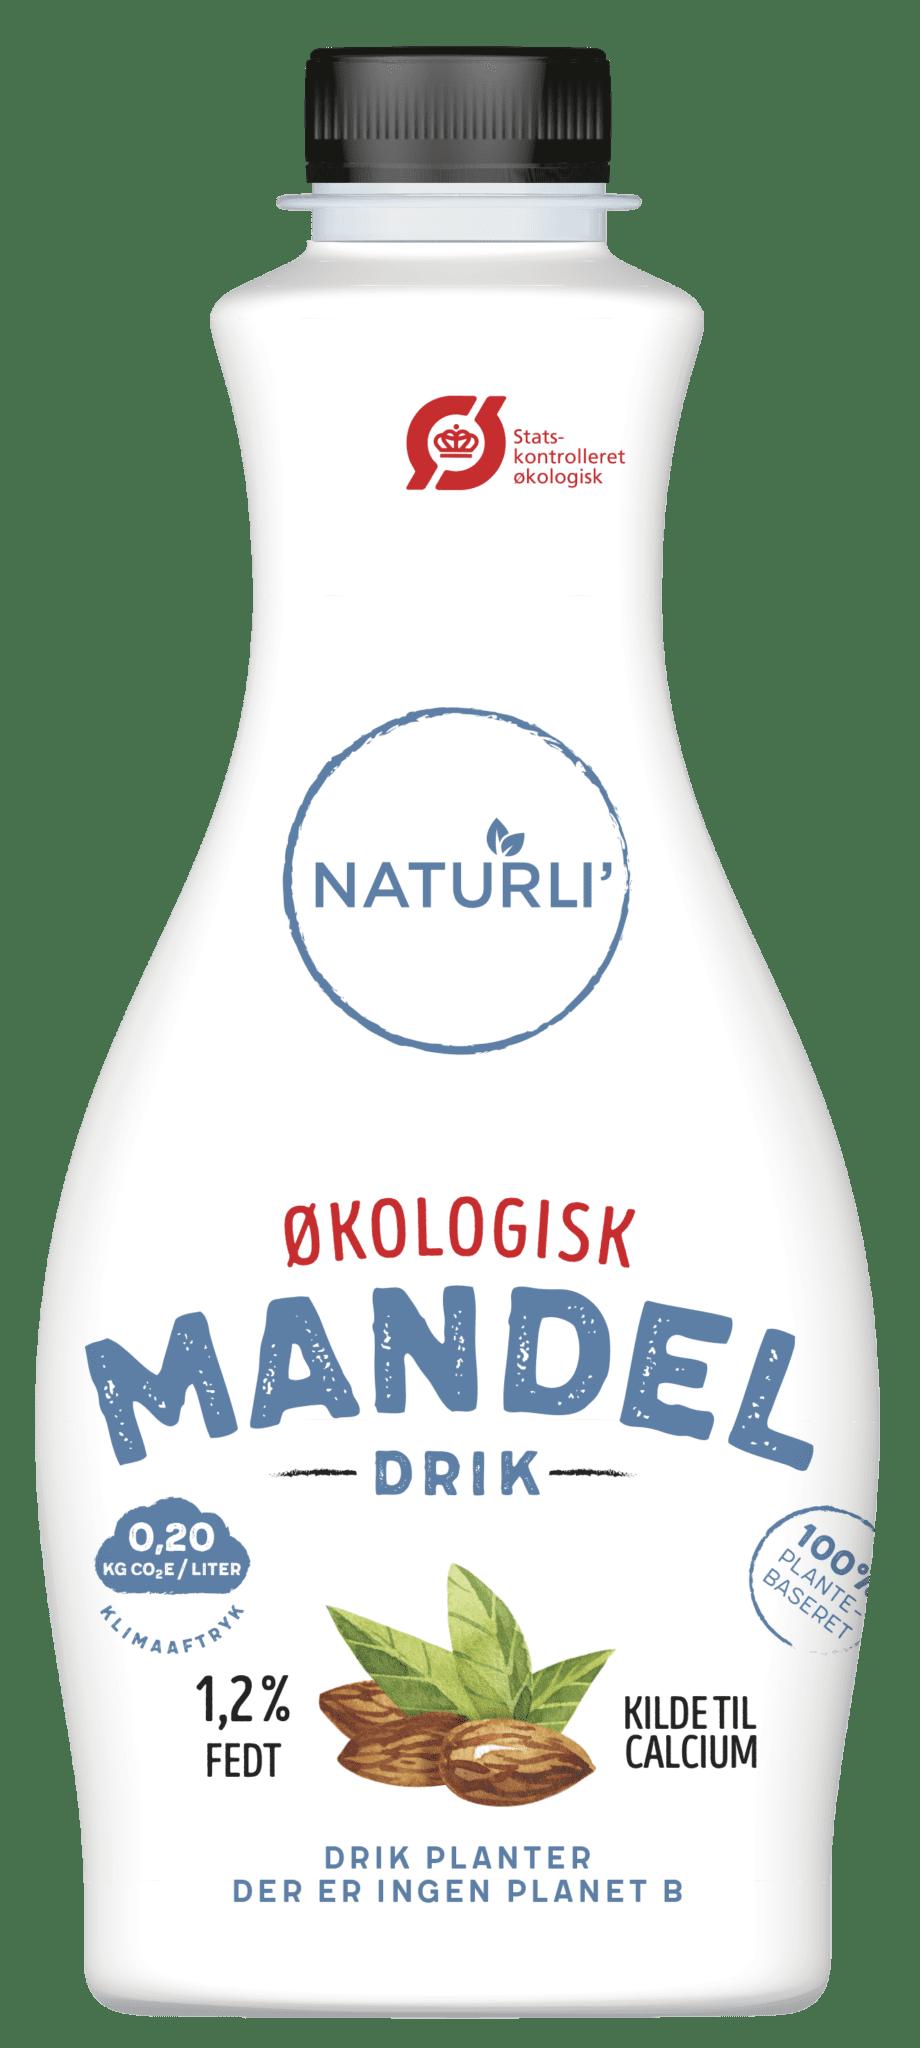 NATURLI' Mandeldrik